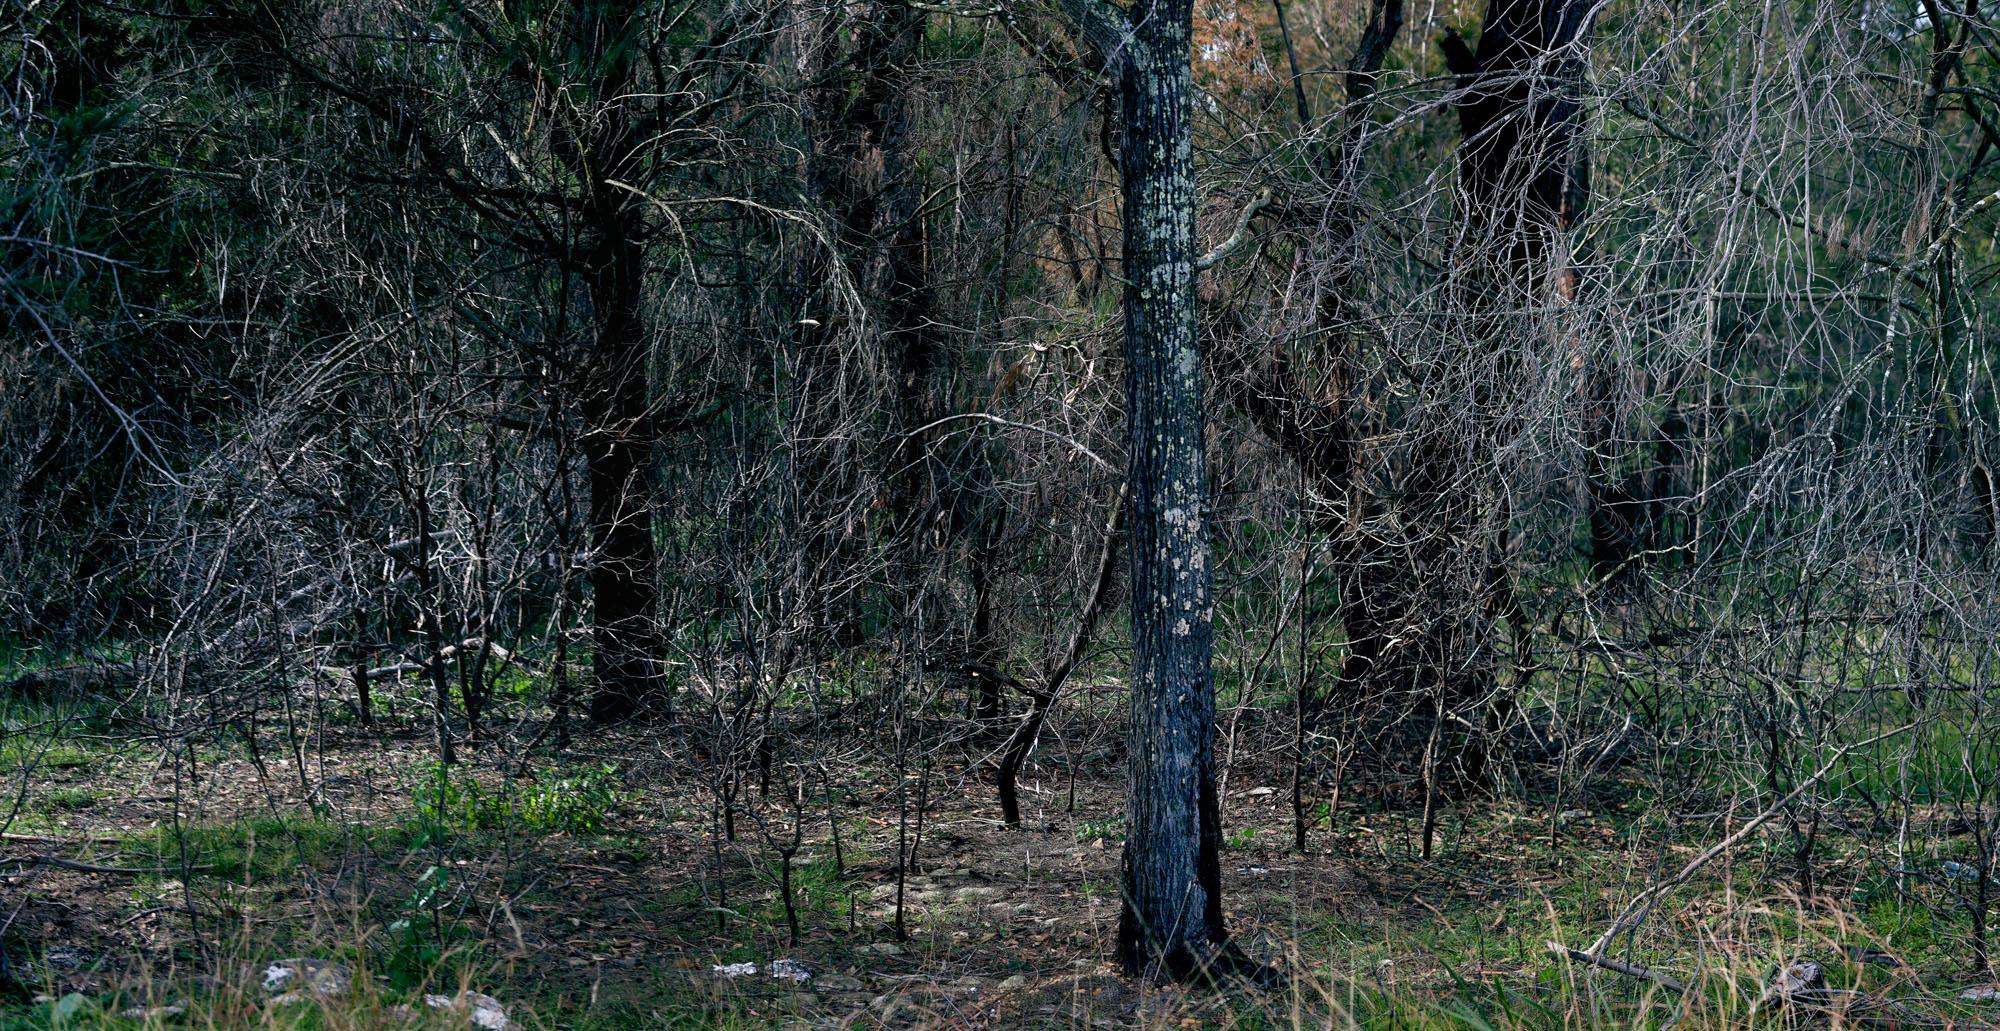 Inland02, Bargo NSW 2013